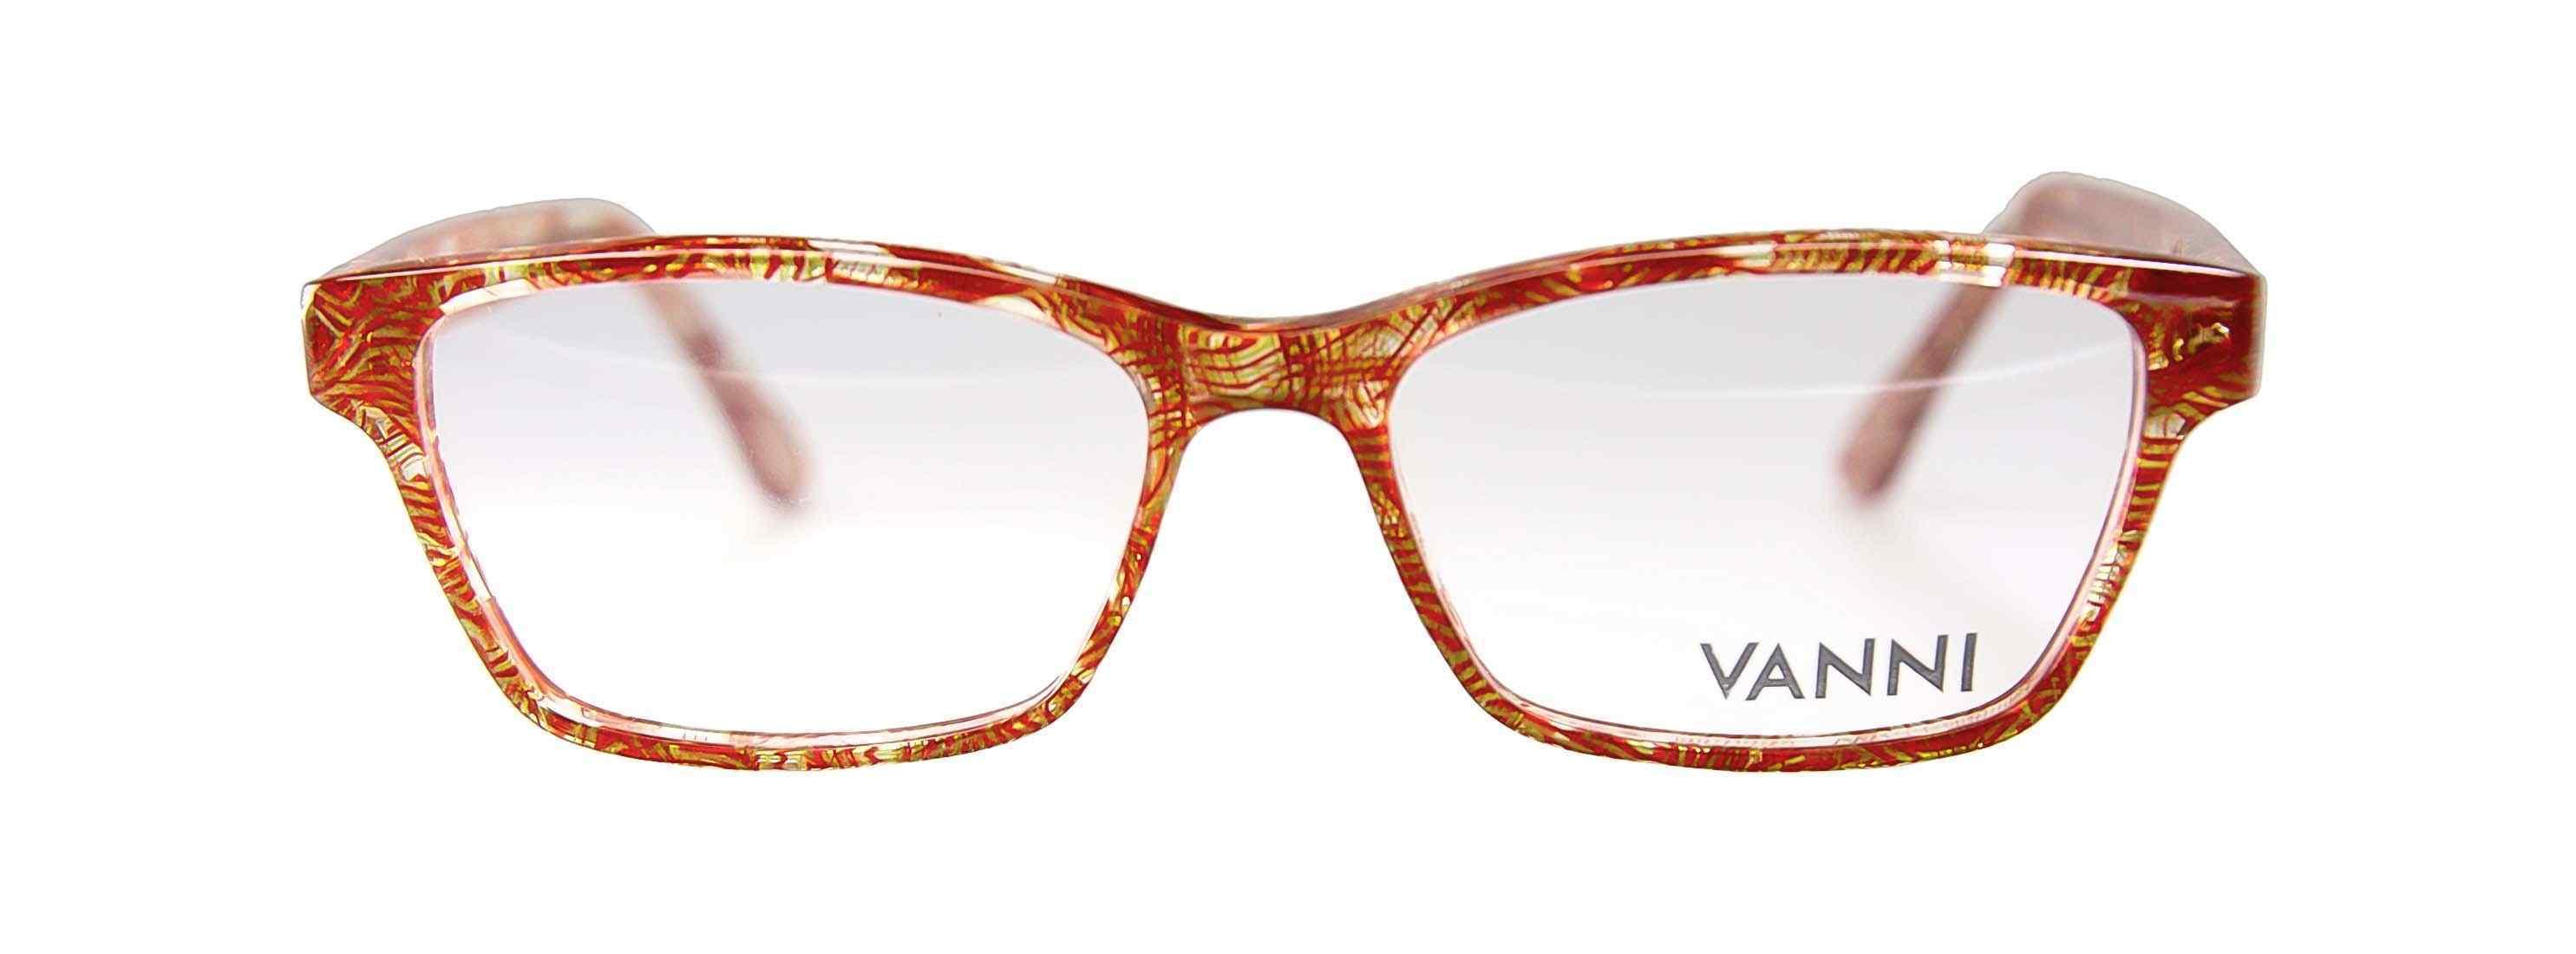 Vanni spectacles 1250 A212 1 2970x1100